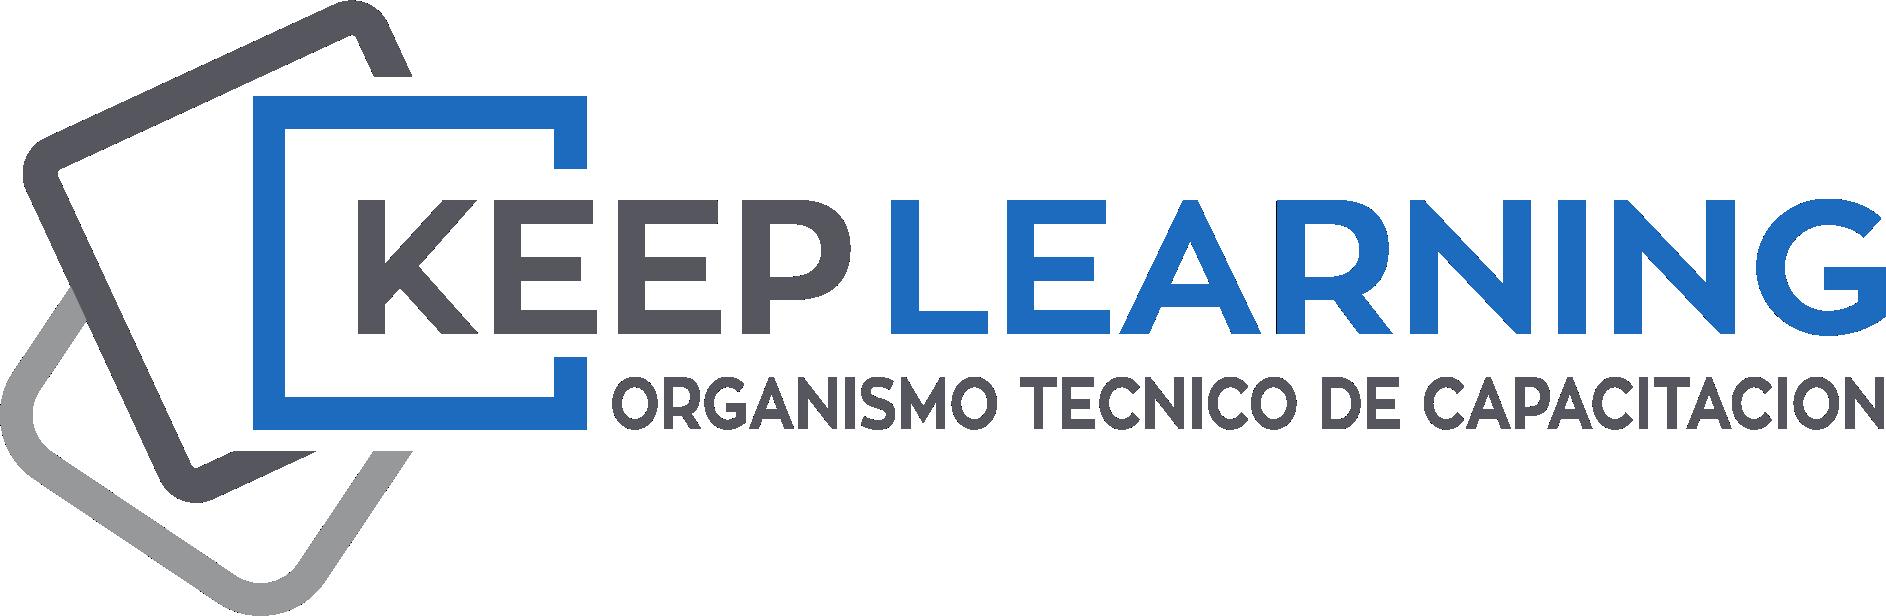 OTEC Keep Learning